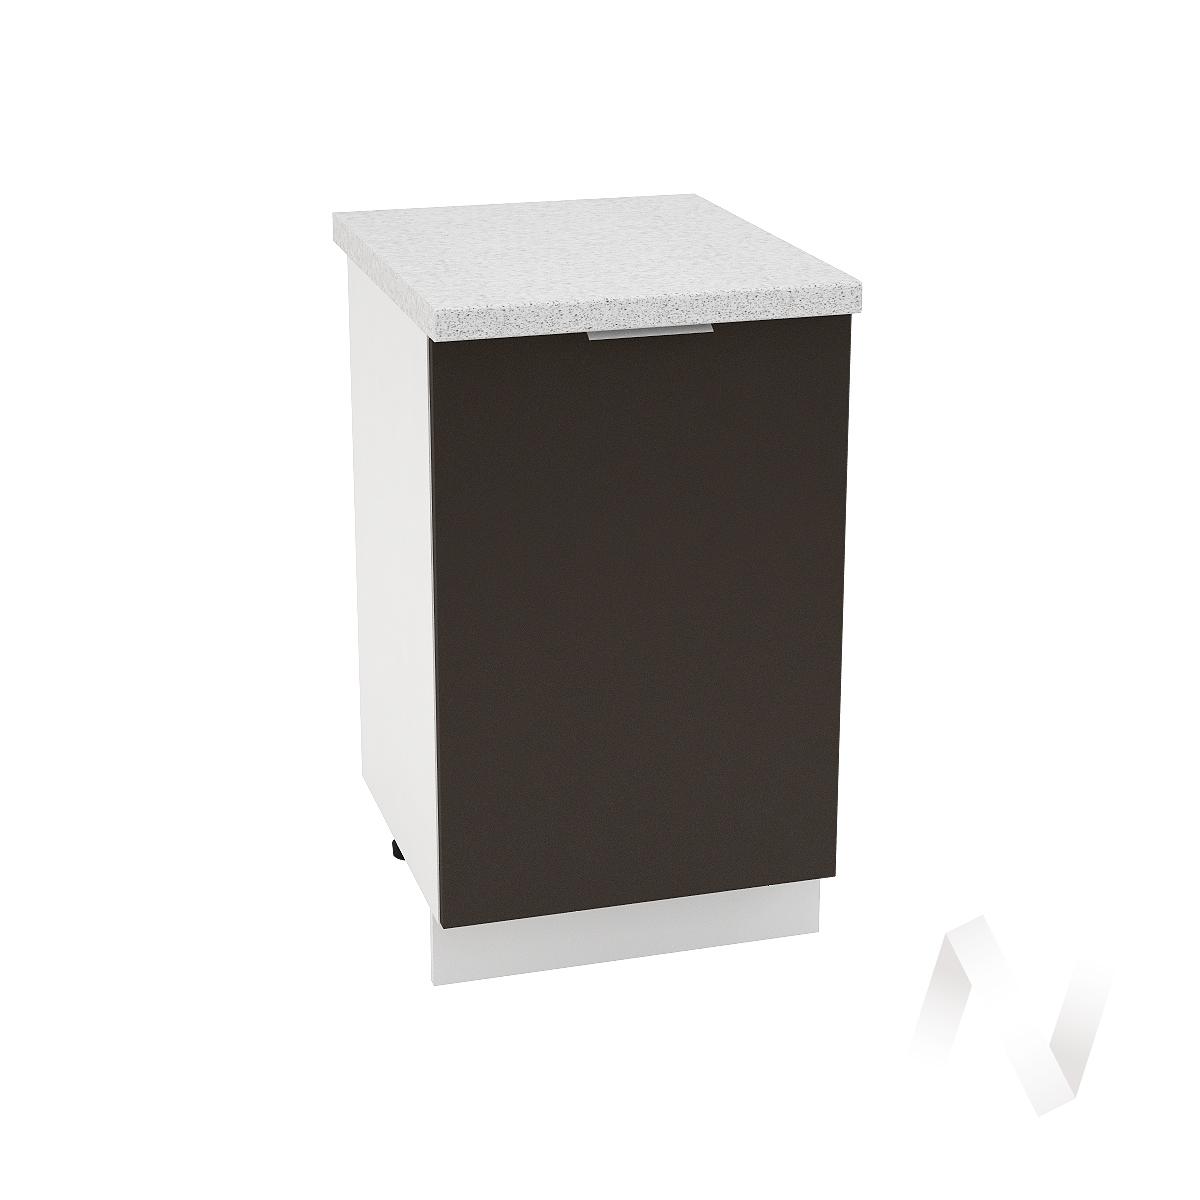 "Кухня ""Терра"": Шкаф нижний 500, ШН 500 (смоки софт/корпус белый)"